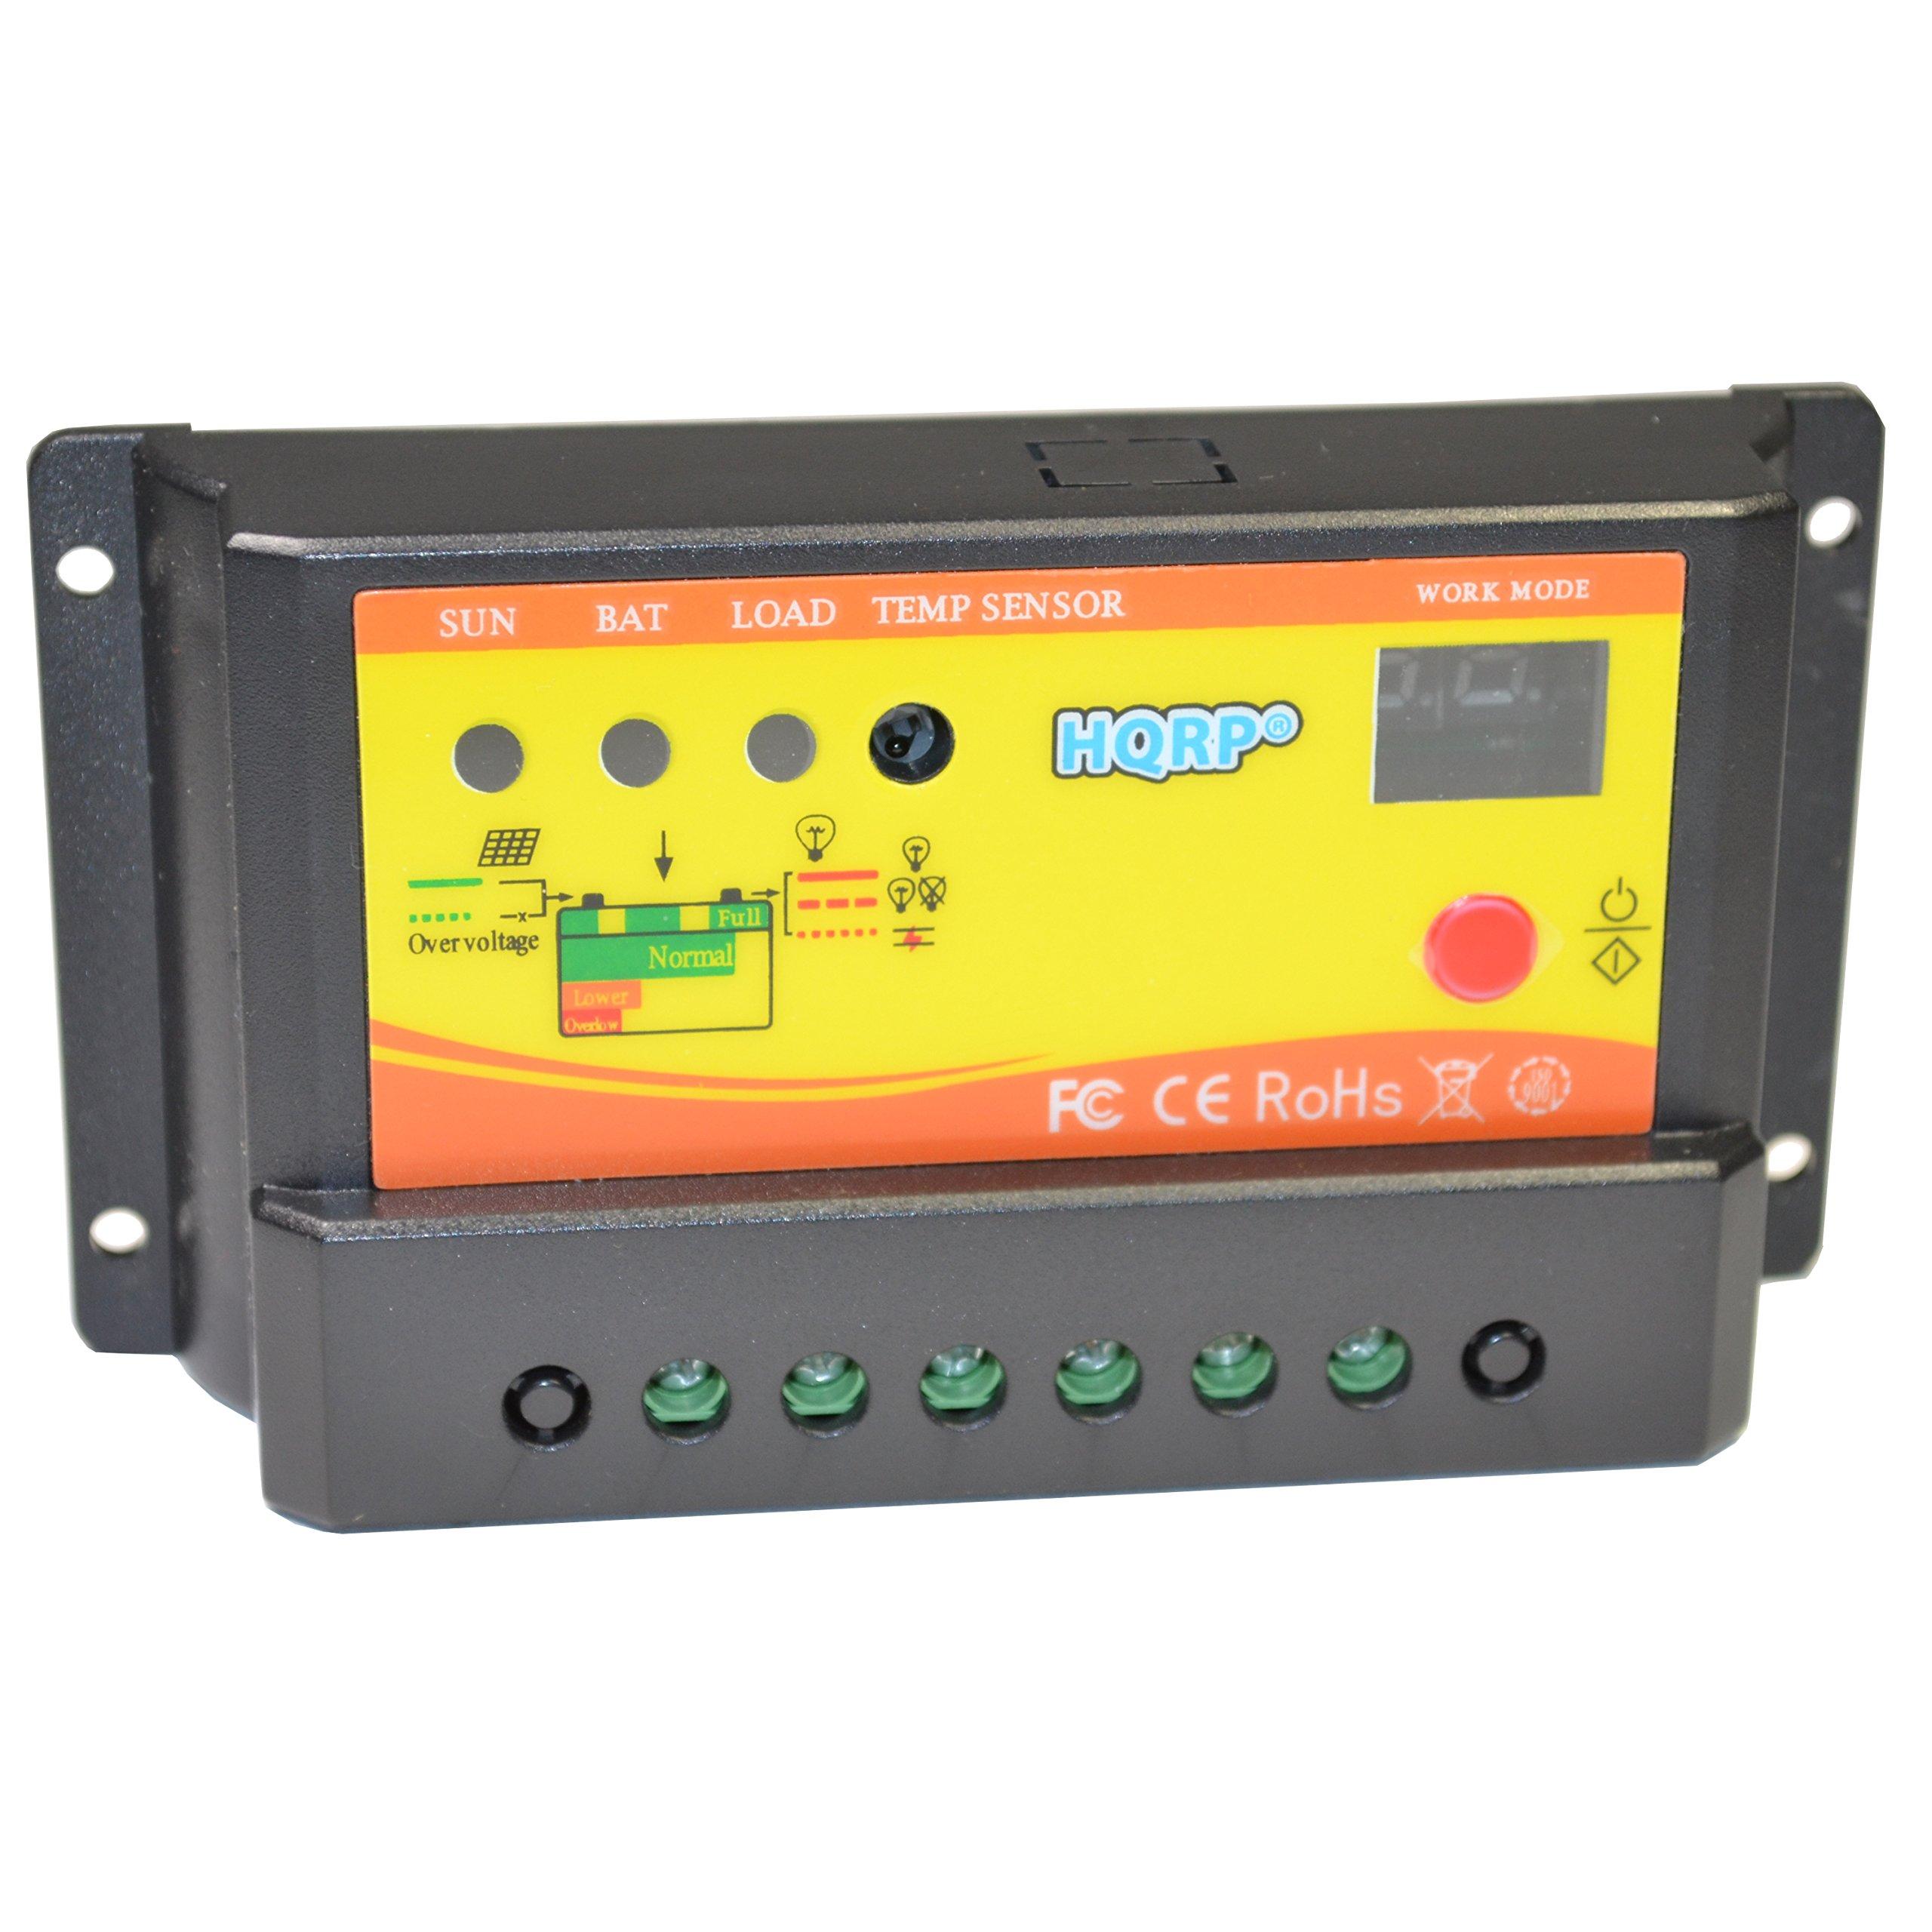 HQRP Solar 10A Charge Power Controller/Regulator 12V / 24V 10 Amp with LED Indicator plus UV Meter